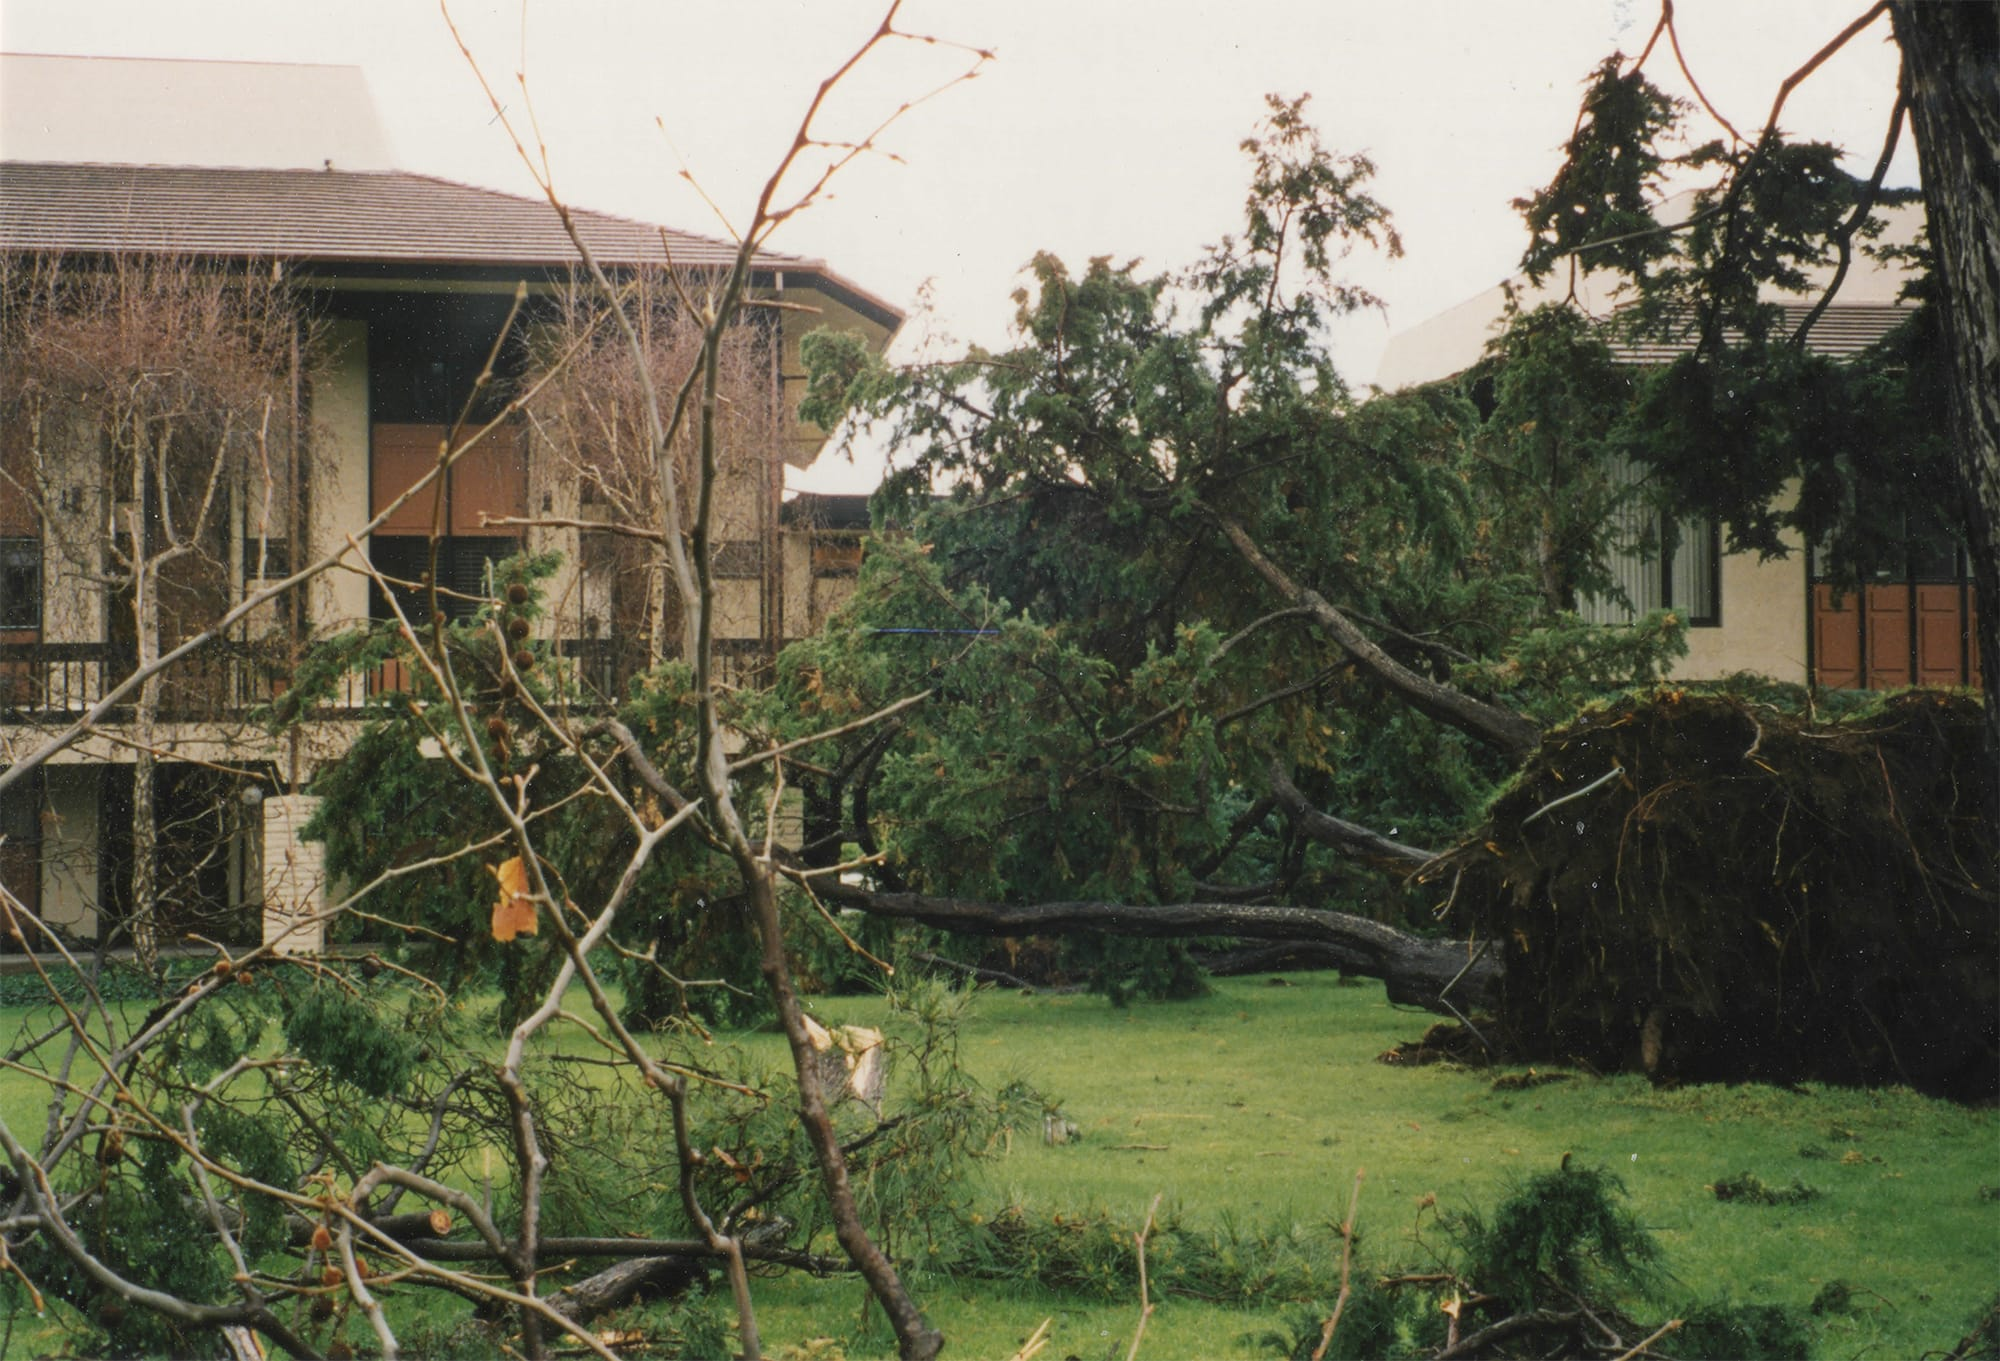 1998 Flood